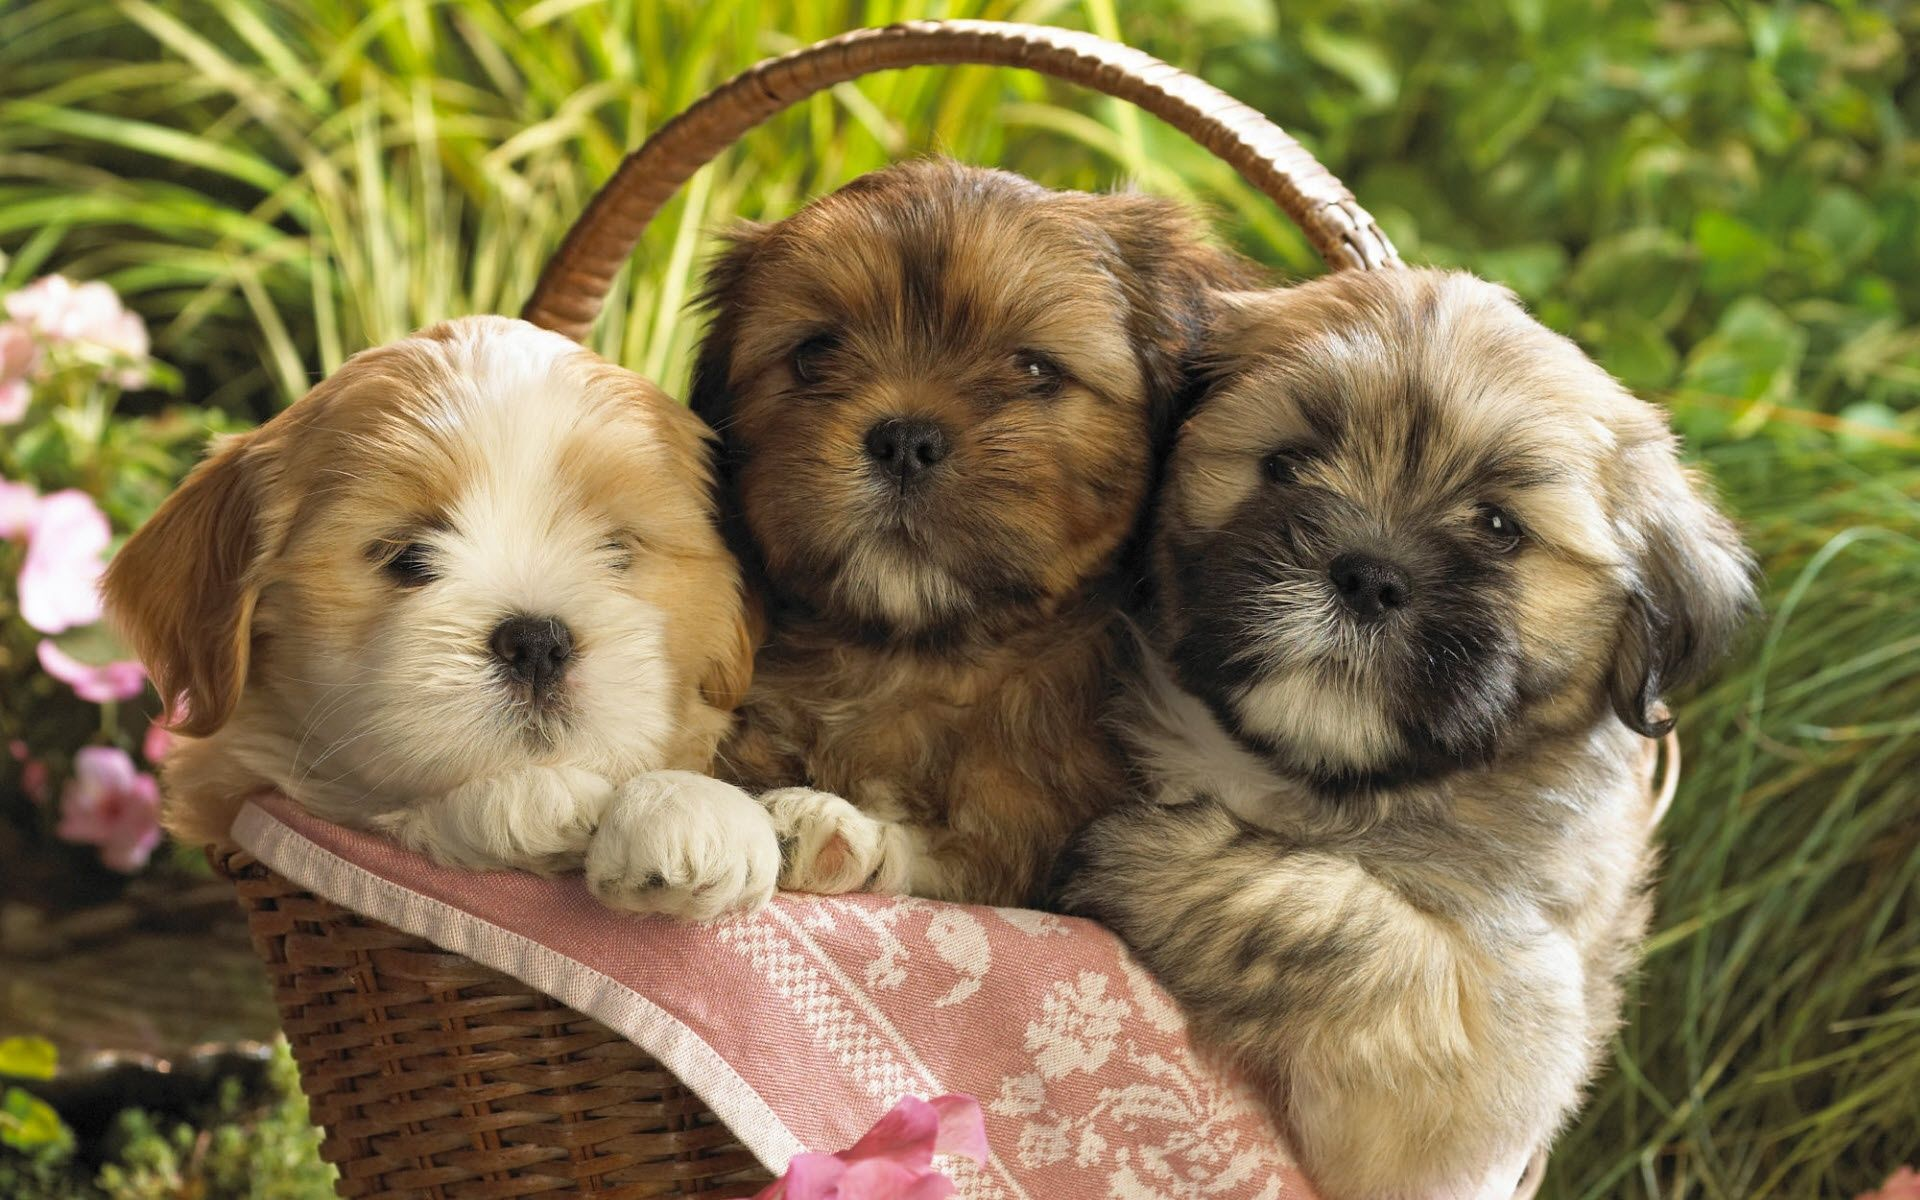 cute baby puppies cute puppies wallpaper desktop background download cute wallpaper